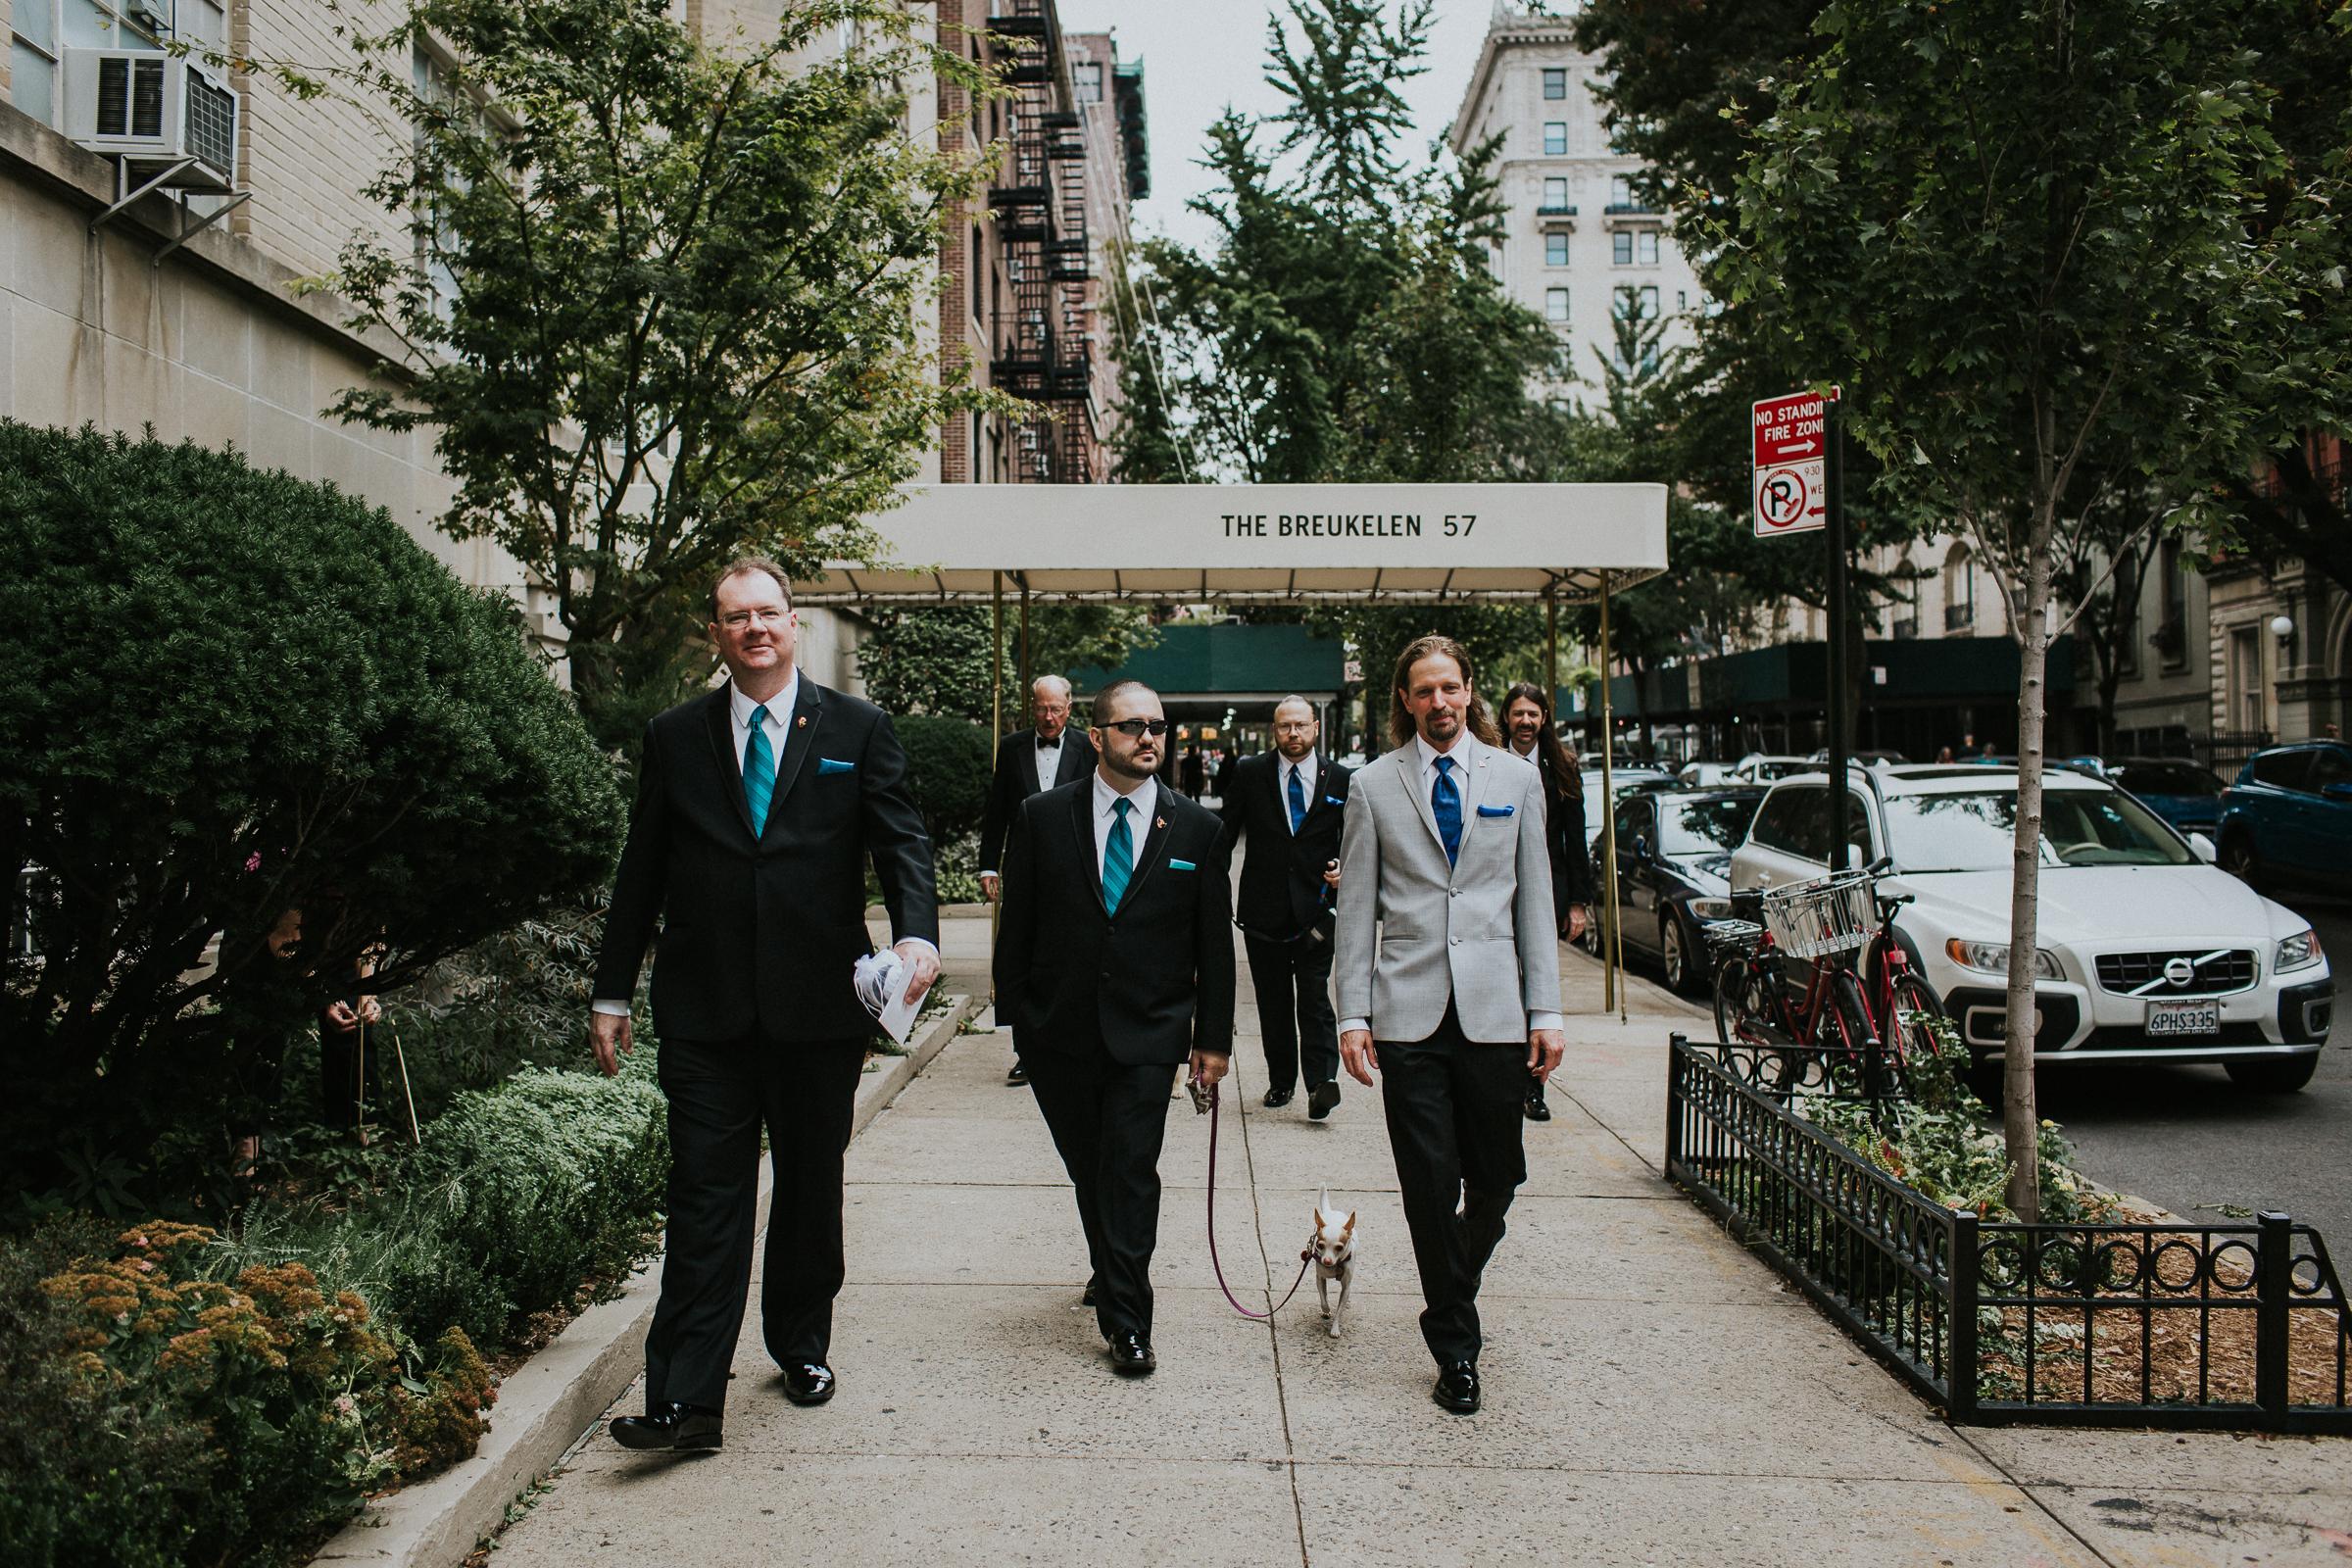 NYC-Brooklyn-Hotel-1-Botanic-Garden-Documentary-Wedding-Photographer-5.jpg